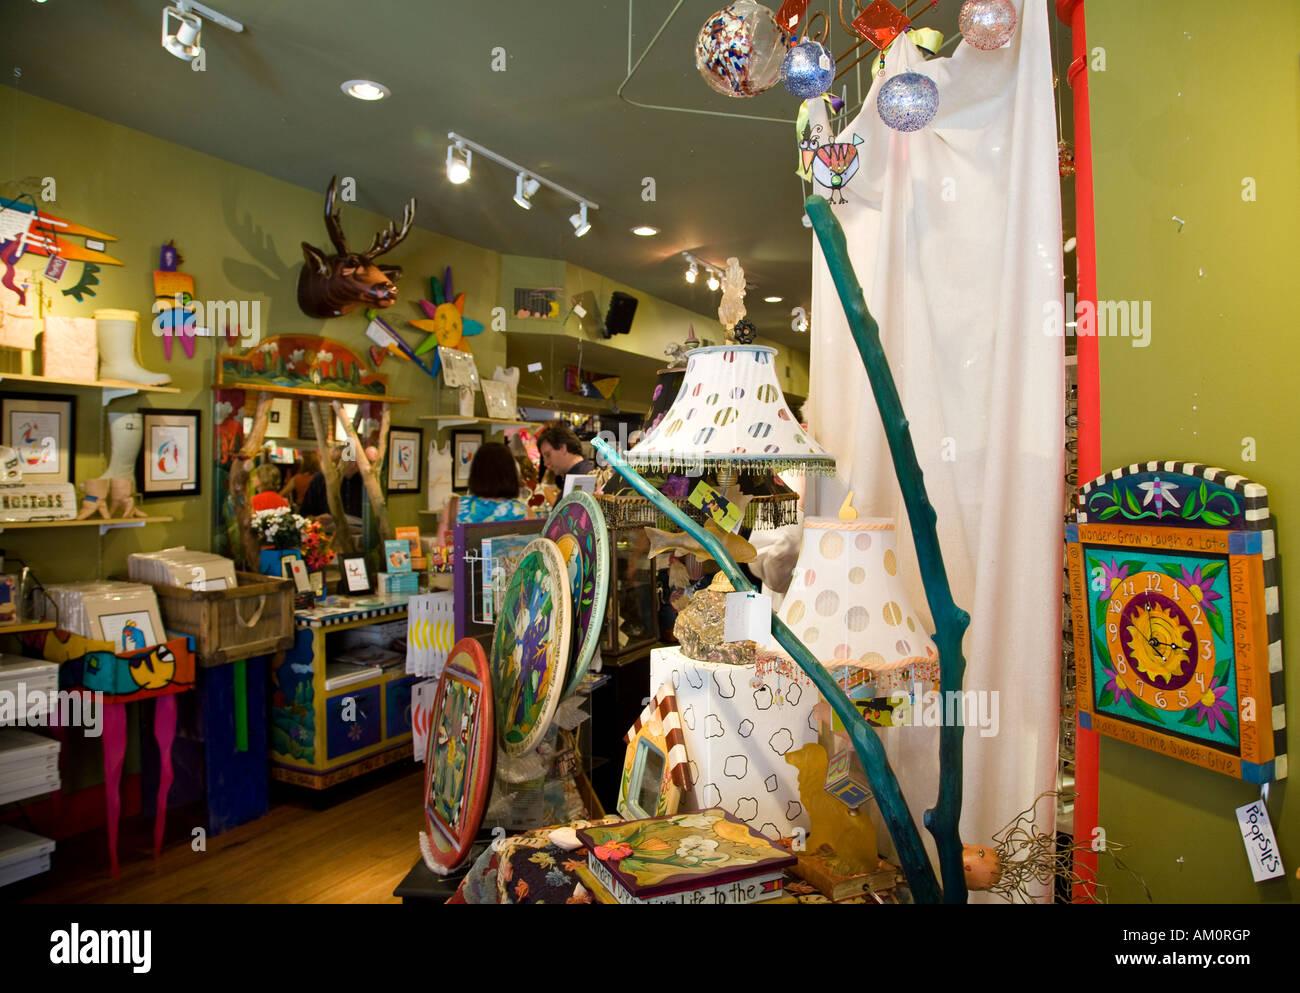 ILLINOIS Galena Items displayed in gift shop interior interior Stock ...